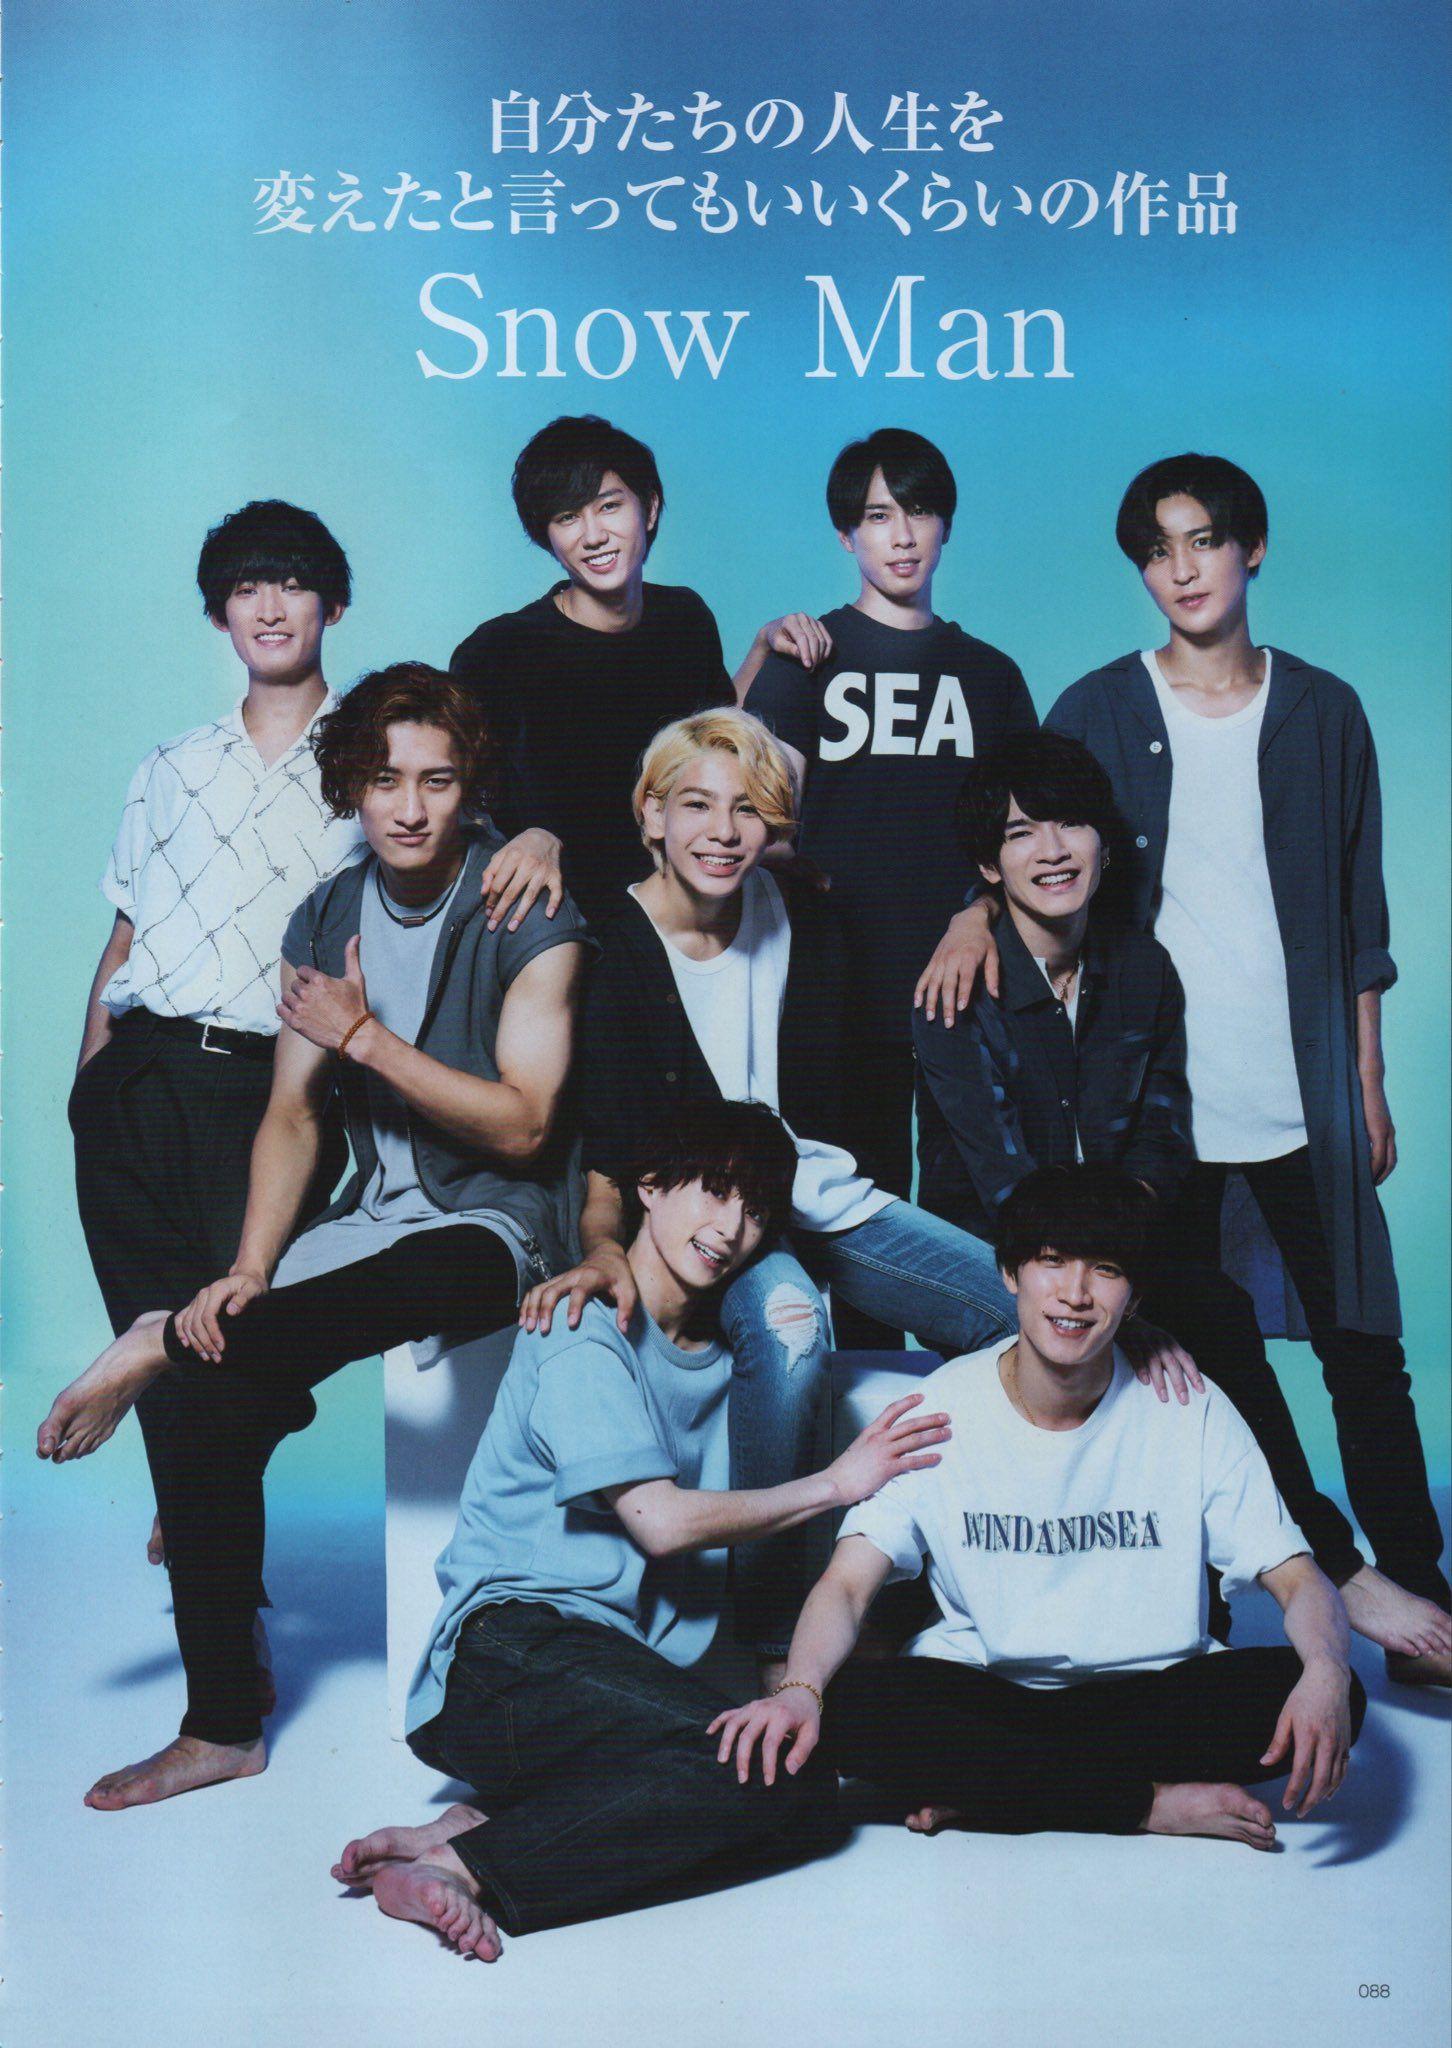 Pin on Snow Man(˶‾᷄ ⁻̫ ‾᷅˵)☃